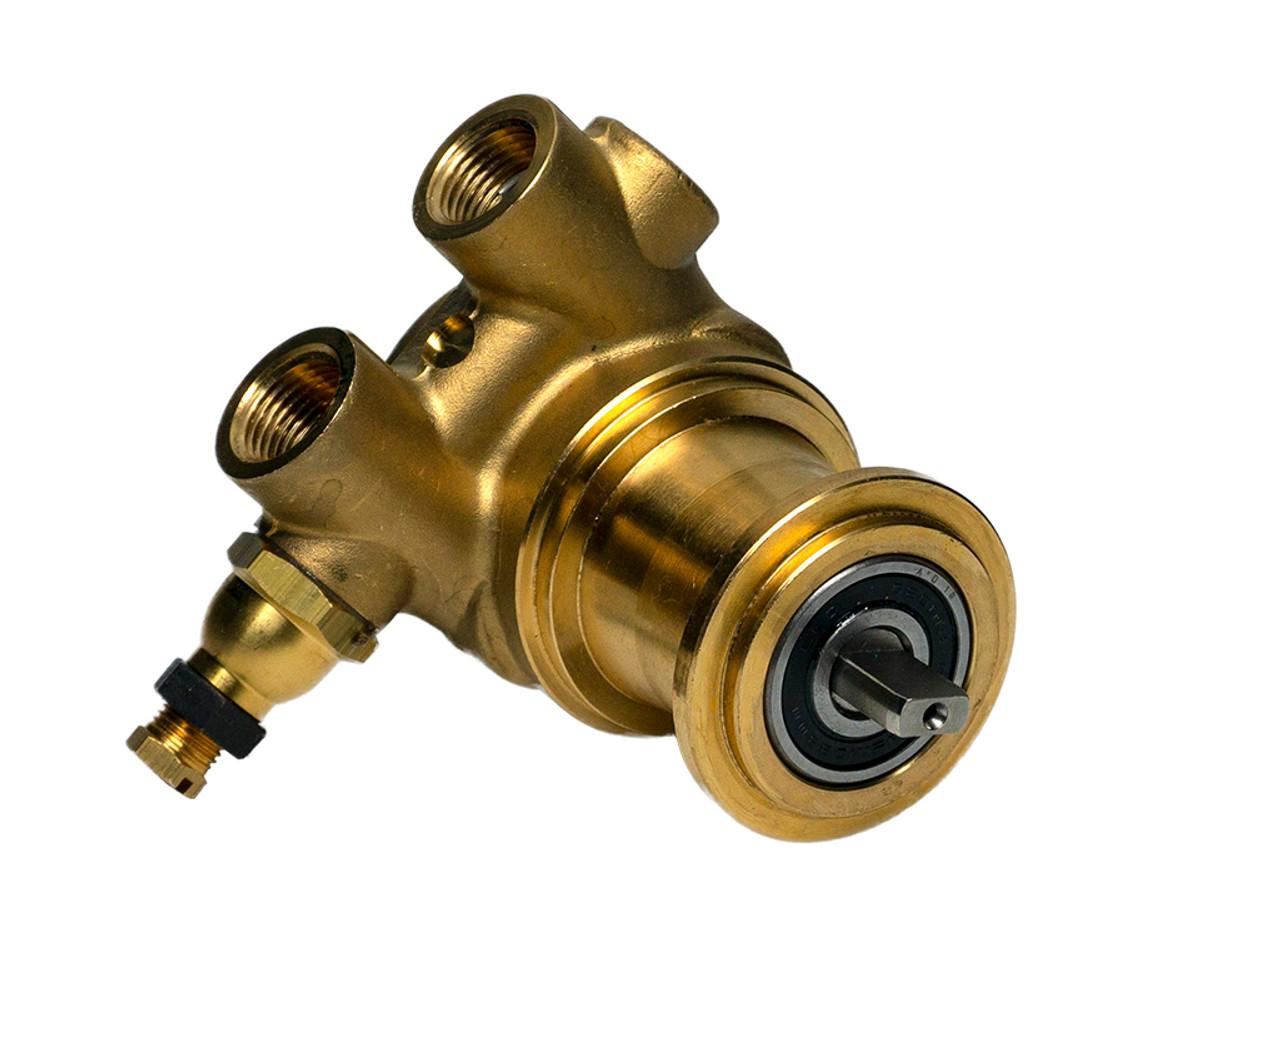 Fluid O Tech rotary vane pump